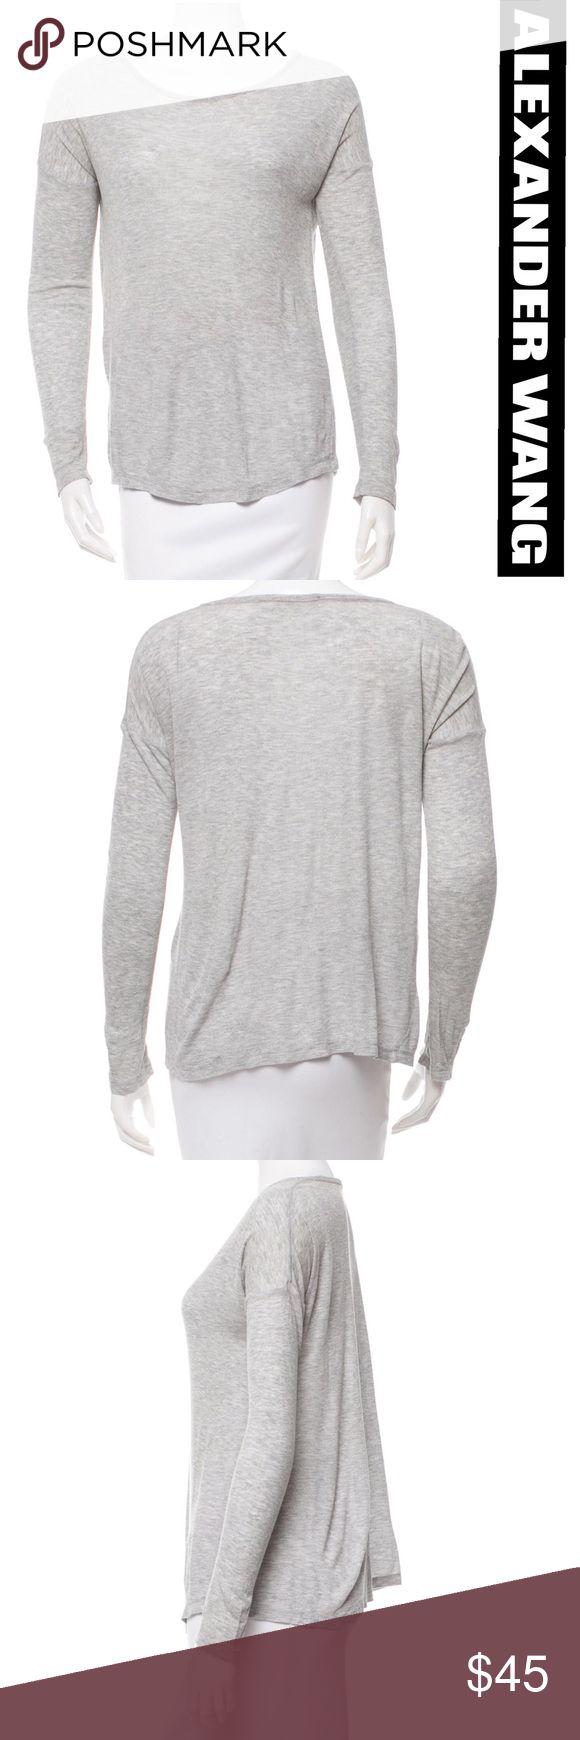 "Alexander Wang Grey Long Sleeve Top Alexander Wang Grey Long Sleeve Top - NWOT. This is from the T By Alexander Wang. Measurements: Bust 42"", Waist 40"" and Length 25"" Alexander Wang Tops Tees - Long Sleeve"